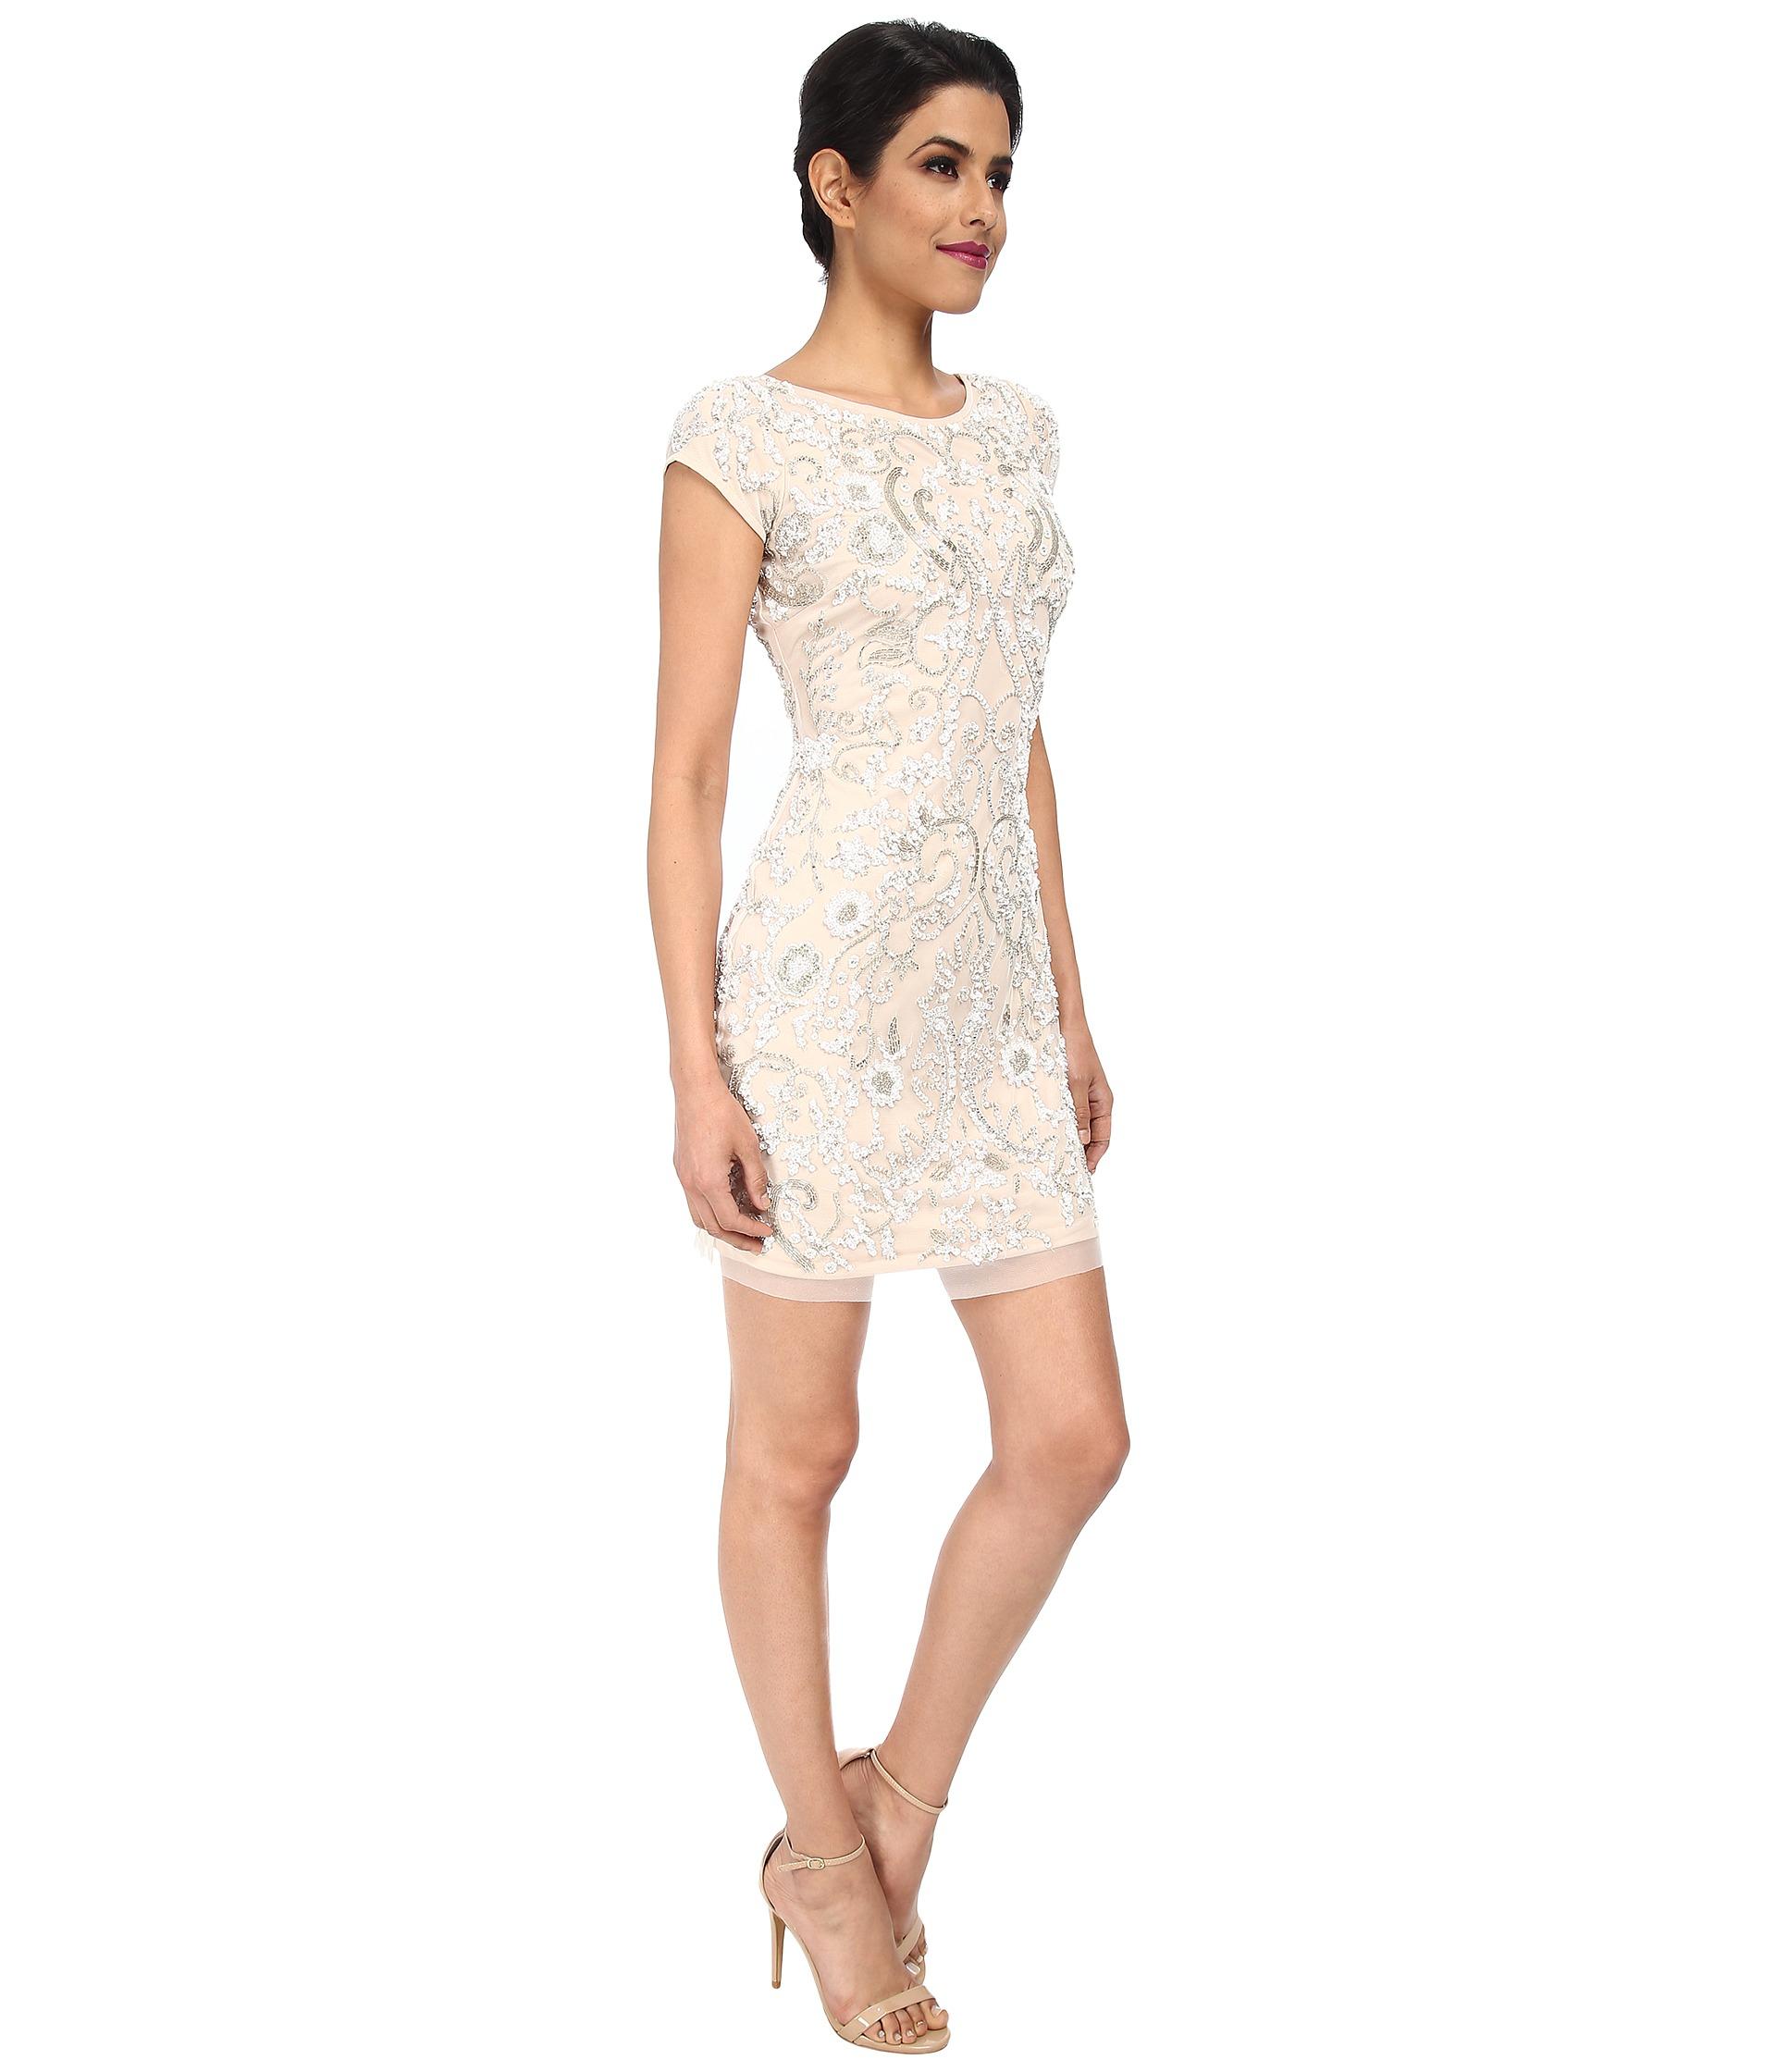 Lyst - Aidan Mattox Cap Sleeve Beaded Cocktail Dress in White